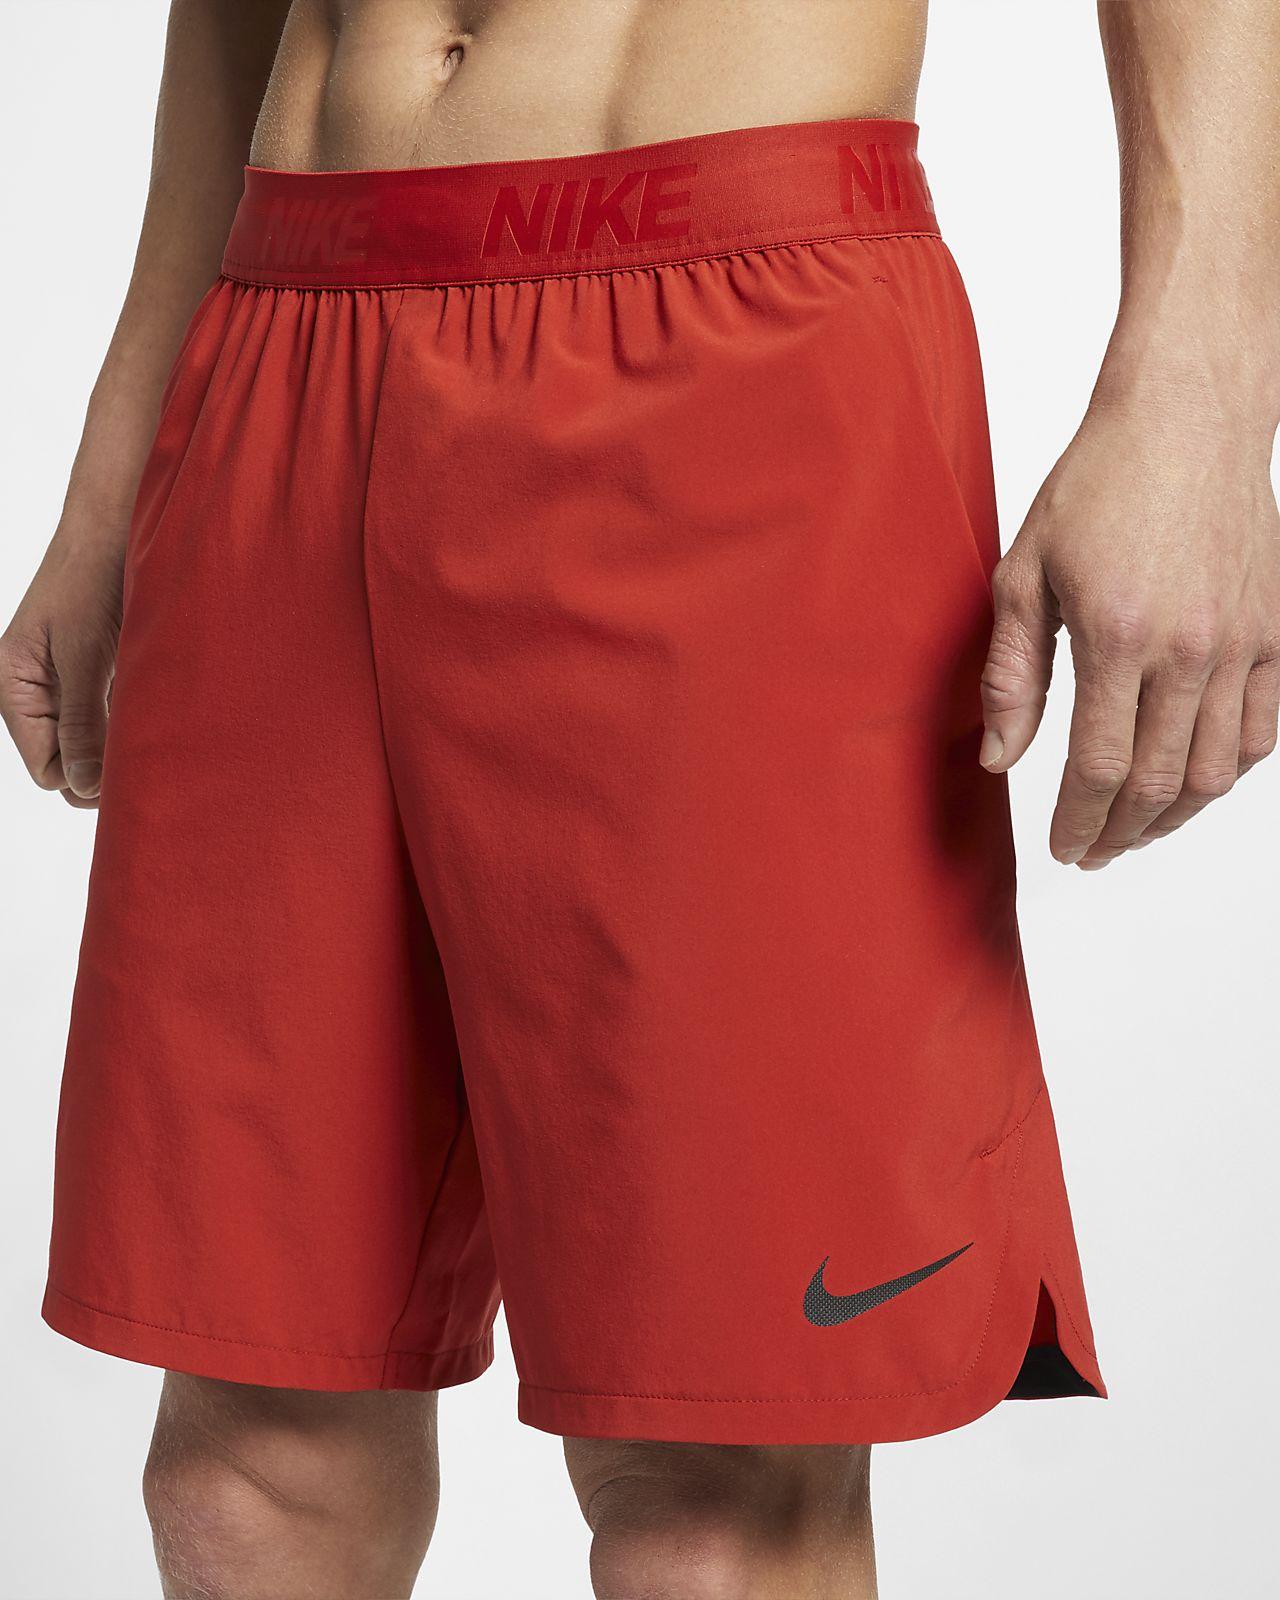 e527283110e2 Nike Flex Men s 8